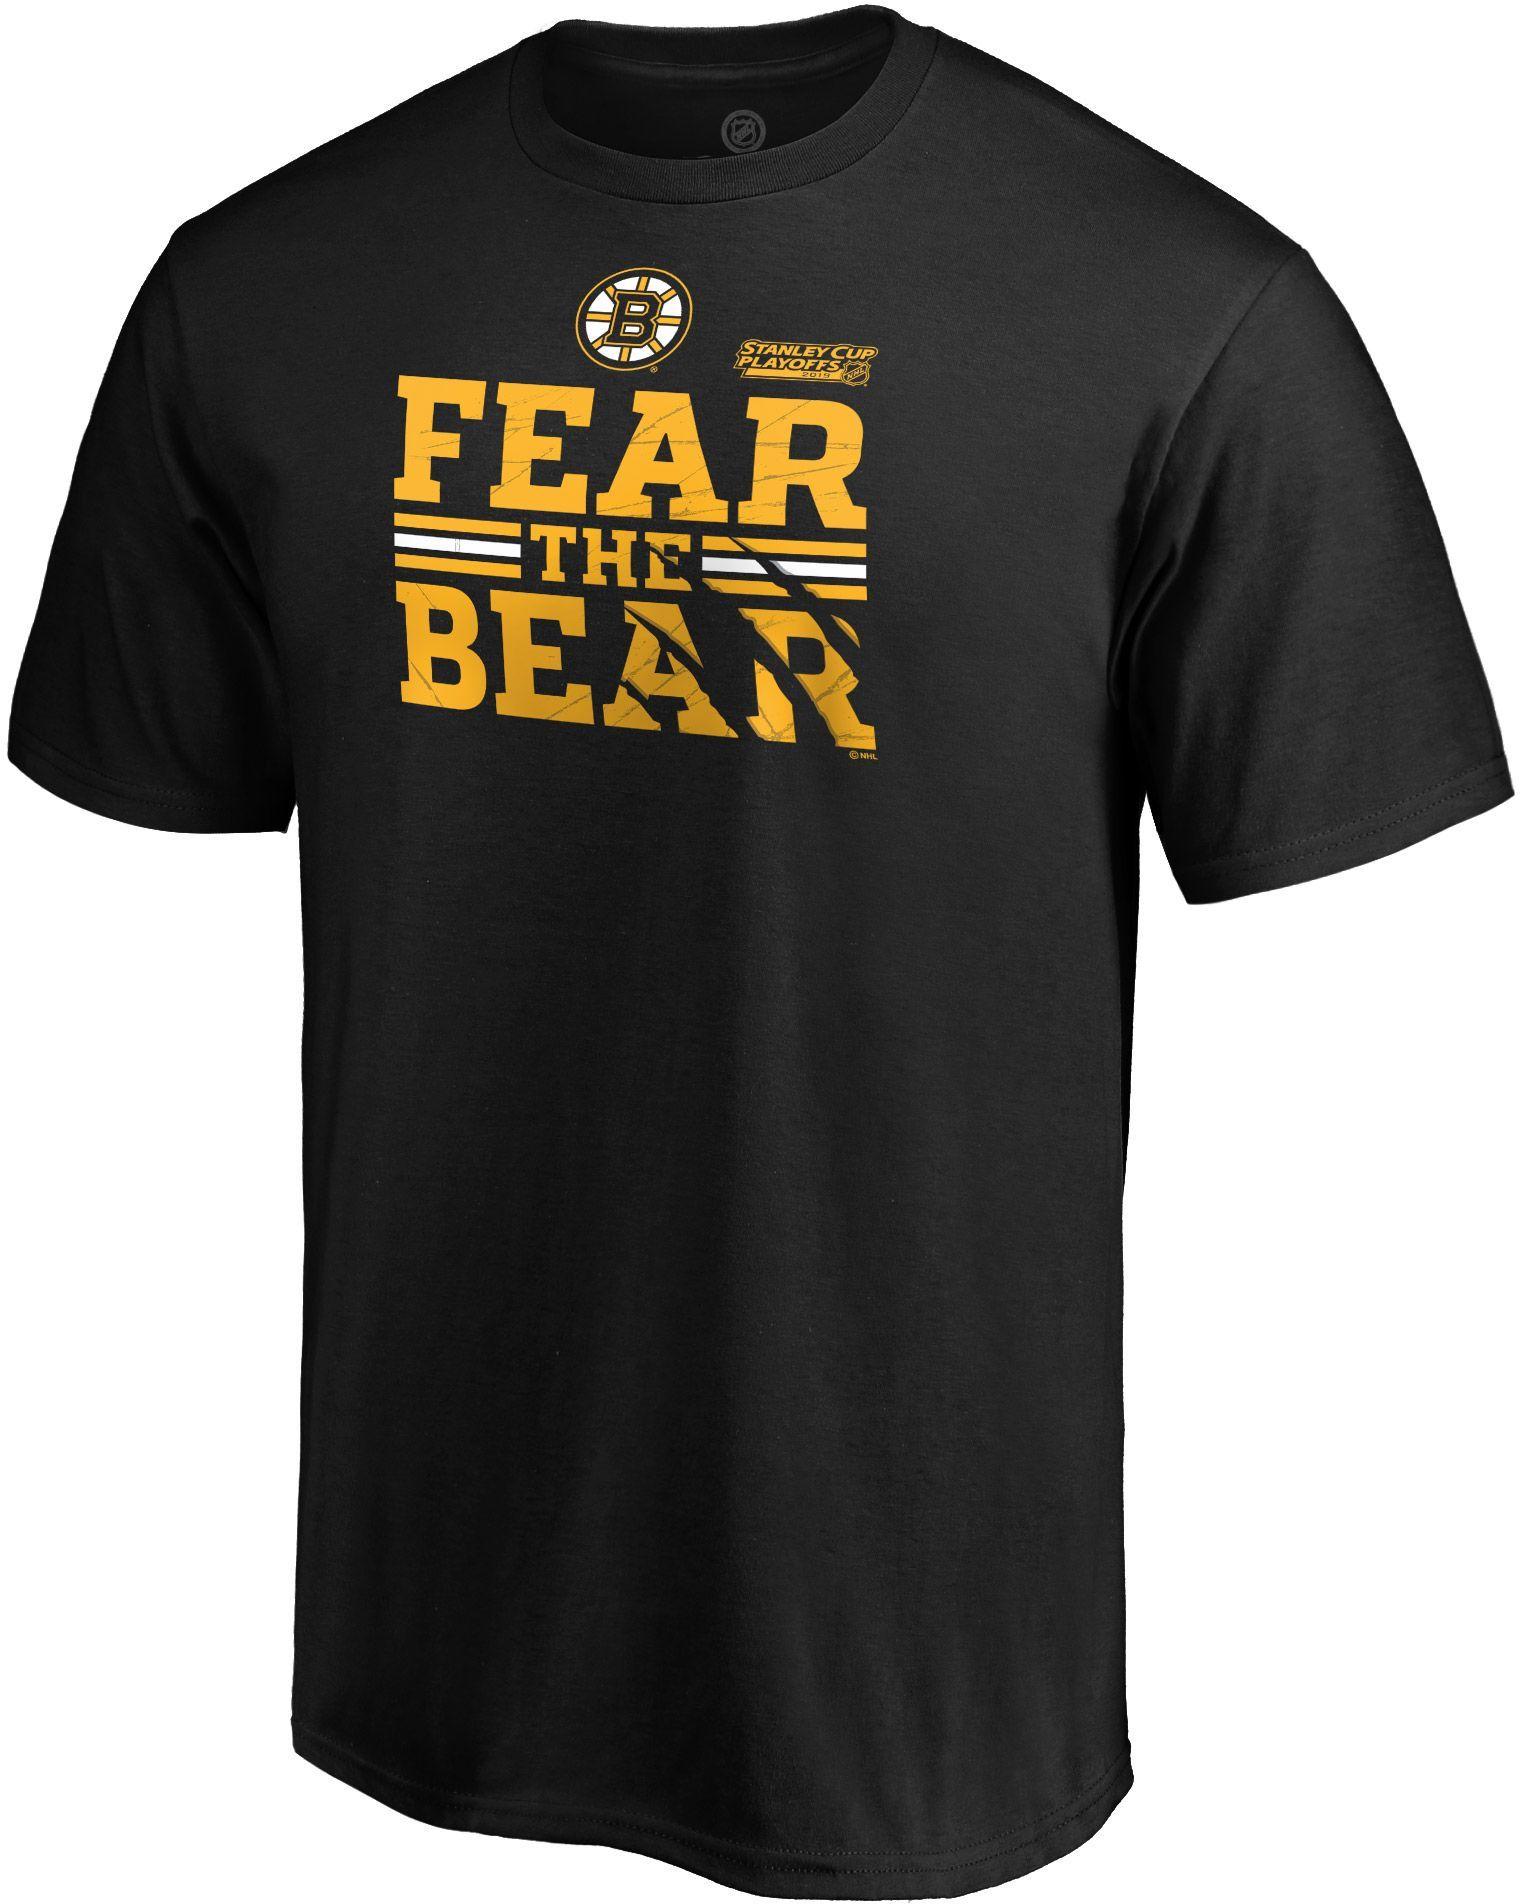 super popular 7c28c e91c0 NHL Men's Boston Bruins 2019 NHL Stanley Cup Playoffs 'Fear ...